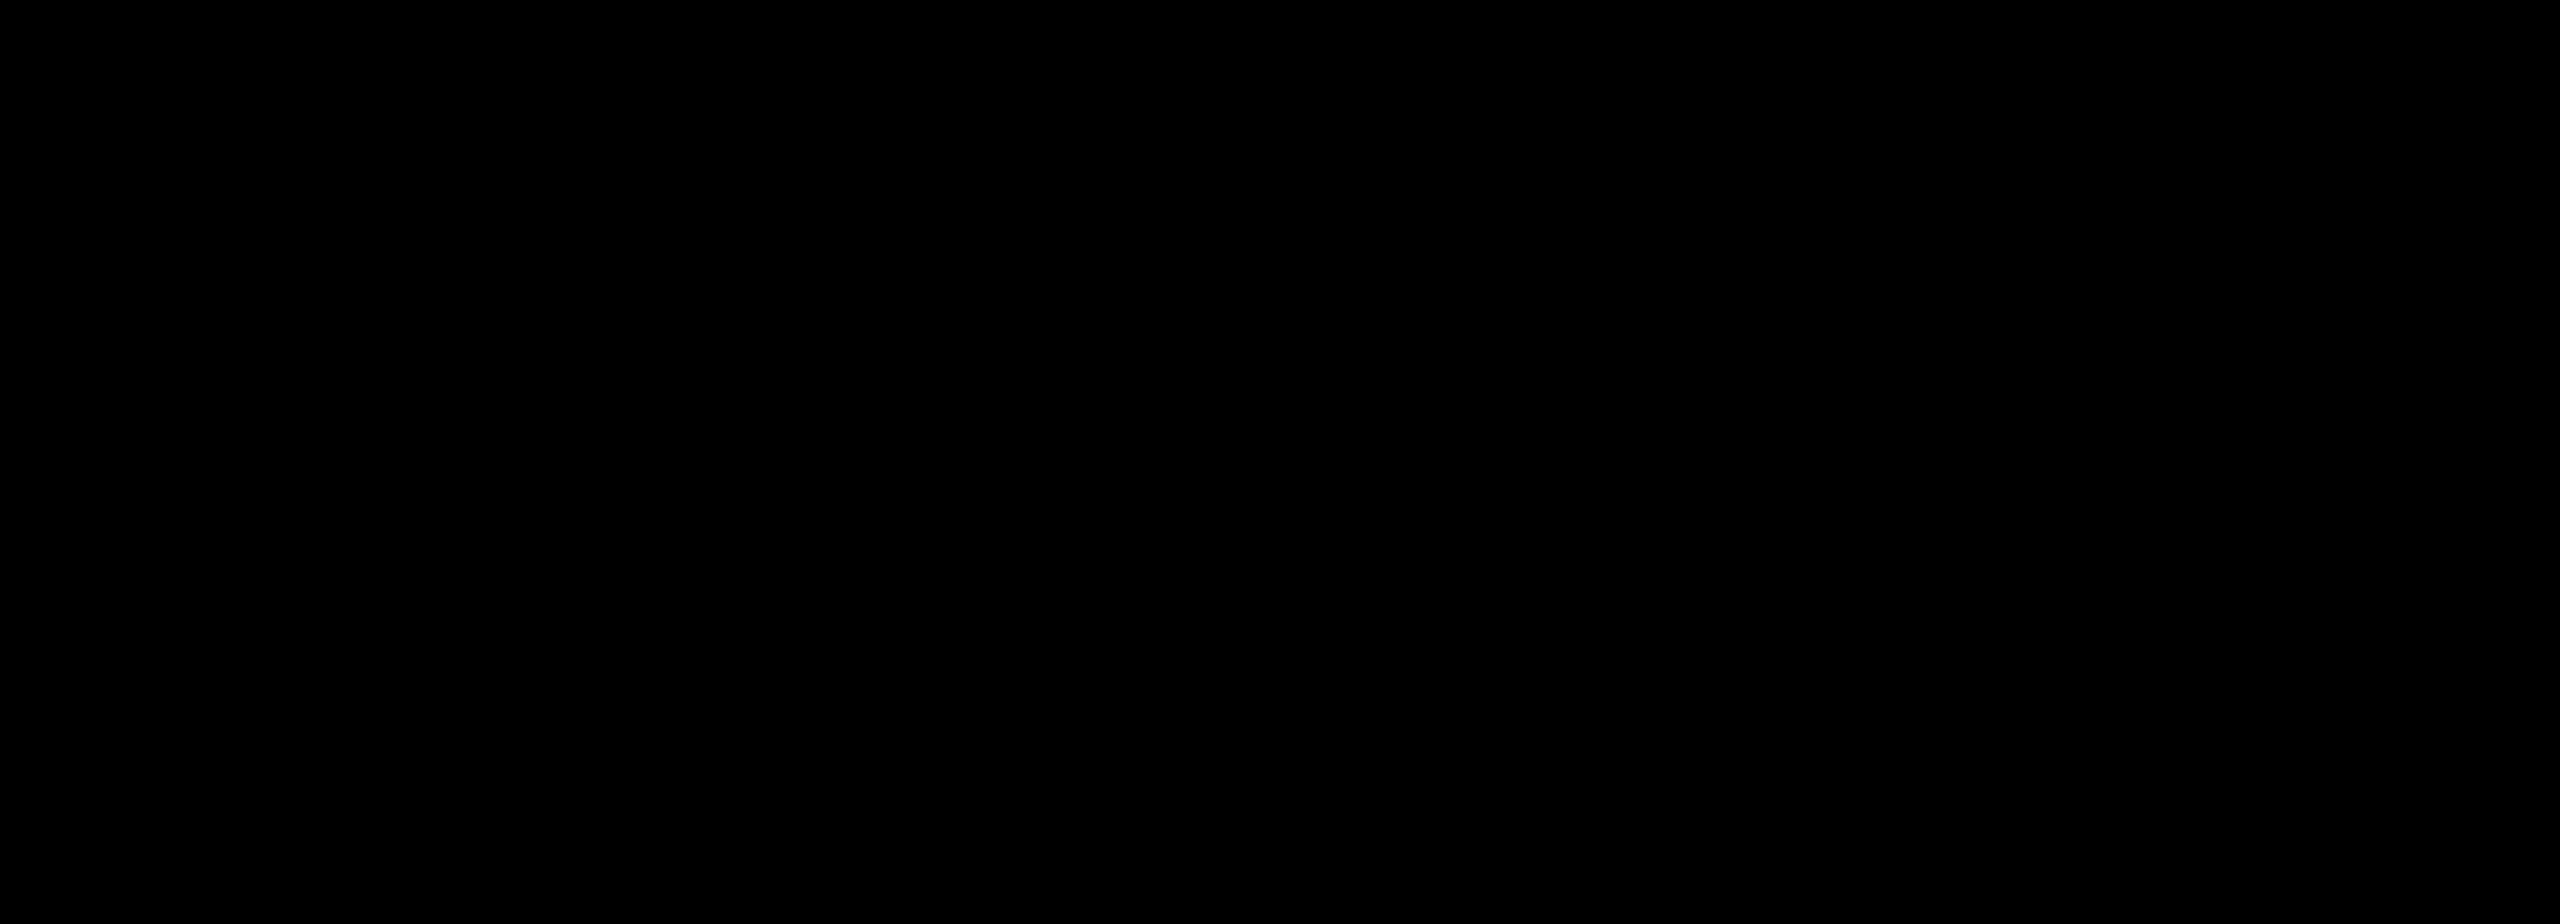 ABPT 2021 long Logo black